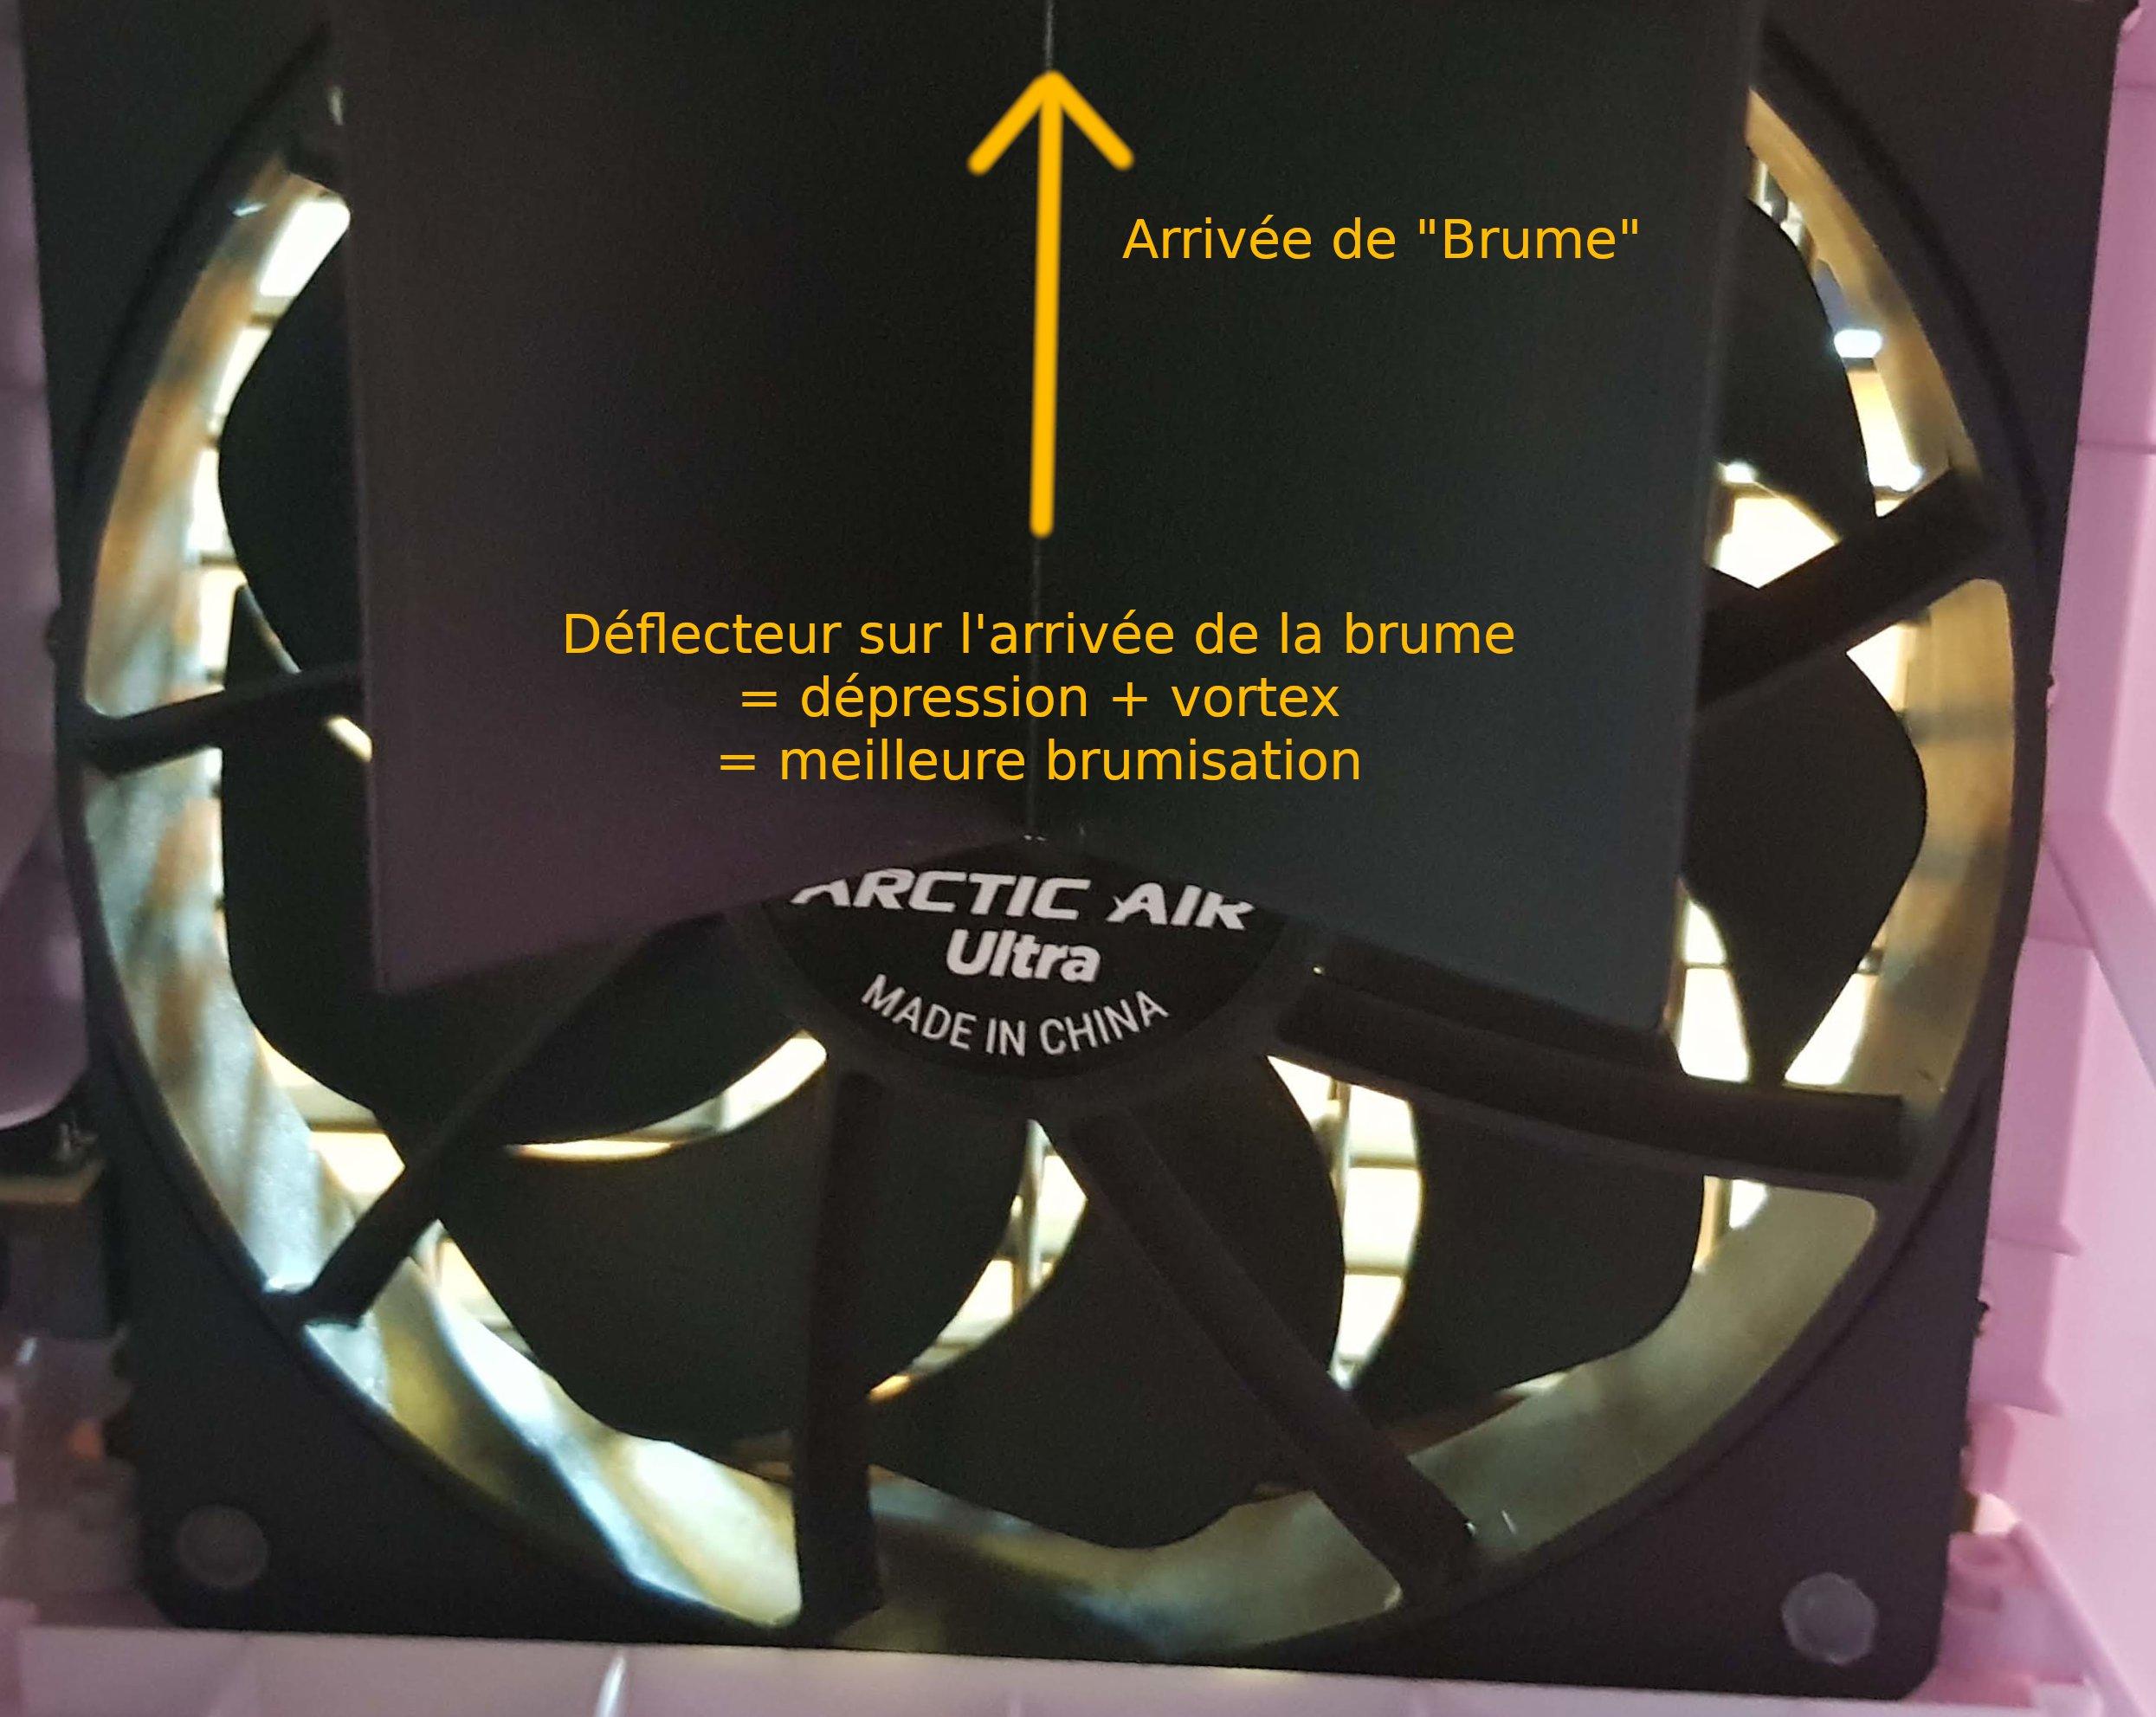 Deflector.jpg